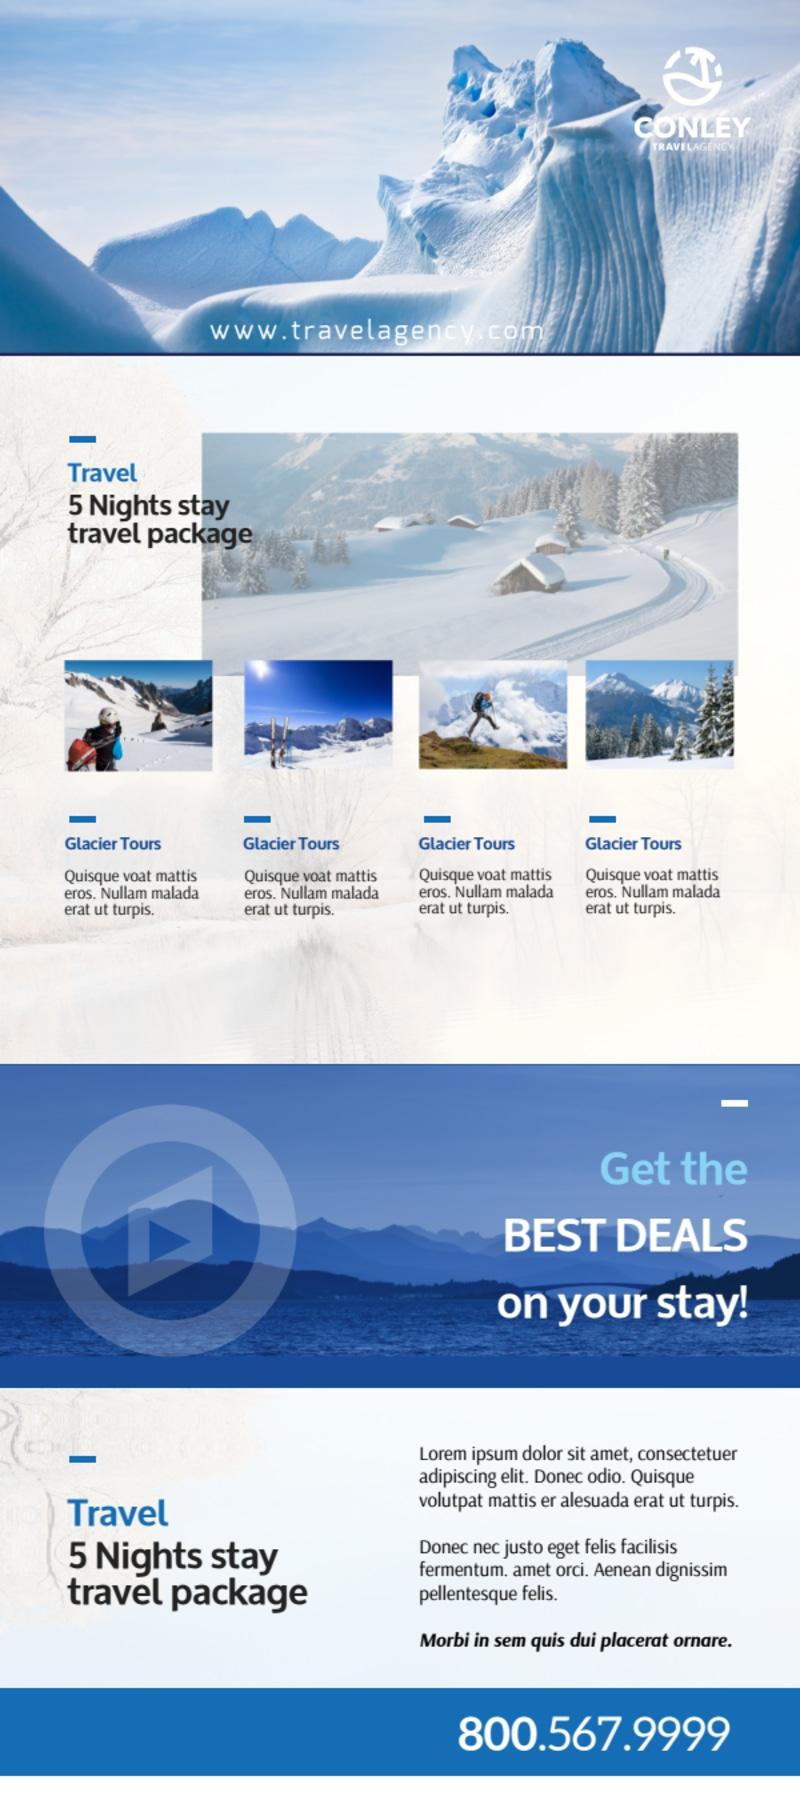 Conley Travel Activities Flyer Template Preview 3